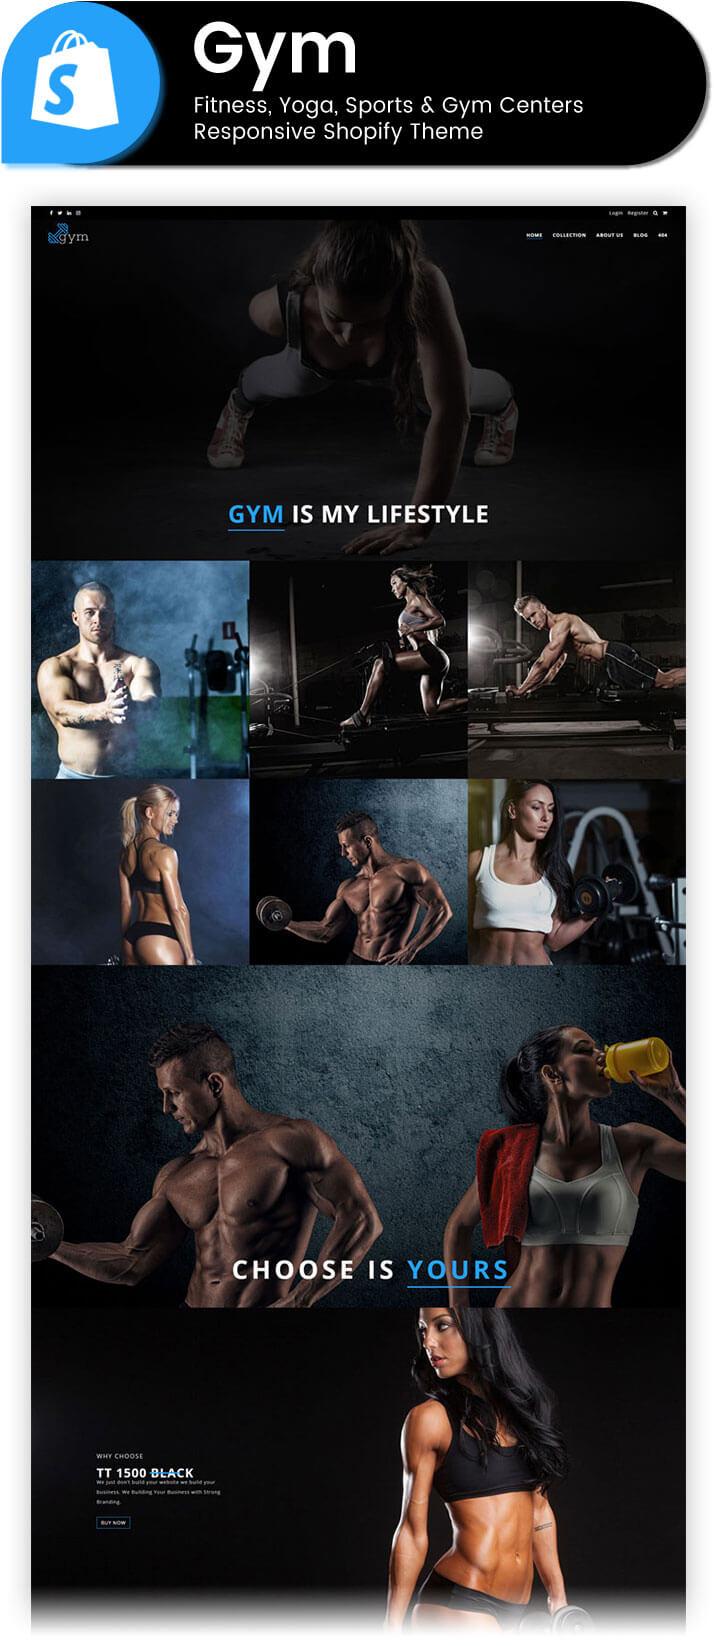 Gym fitness yoga sports gym centers responsive for Gimnasio sport gym